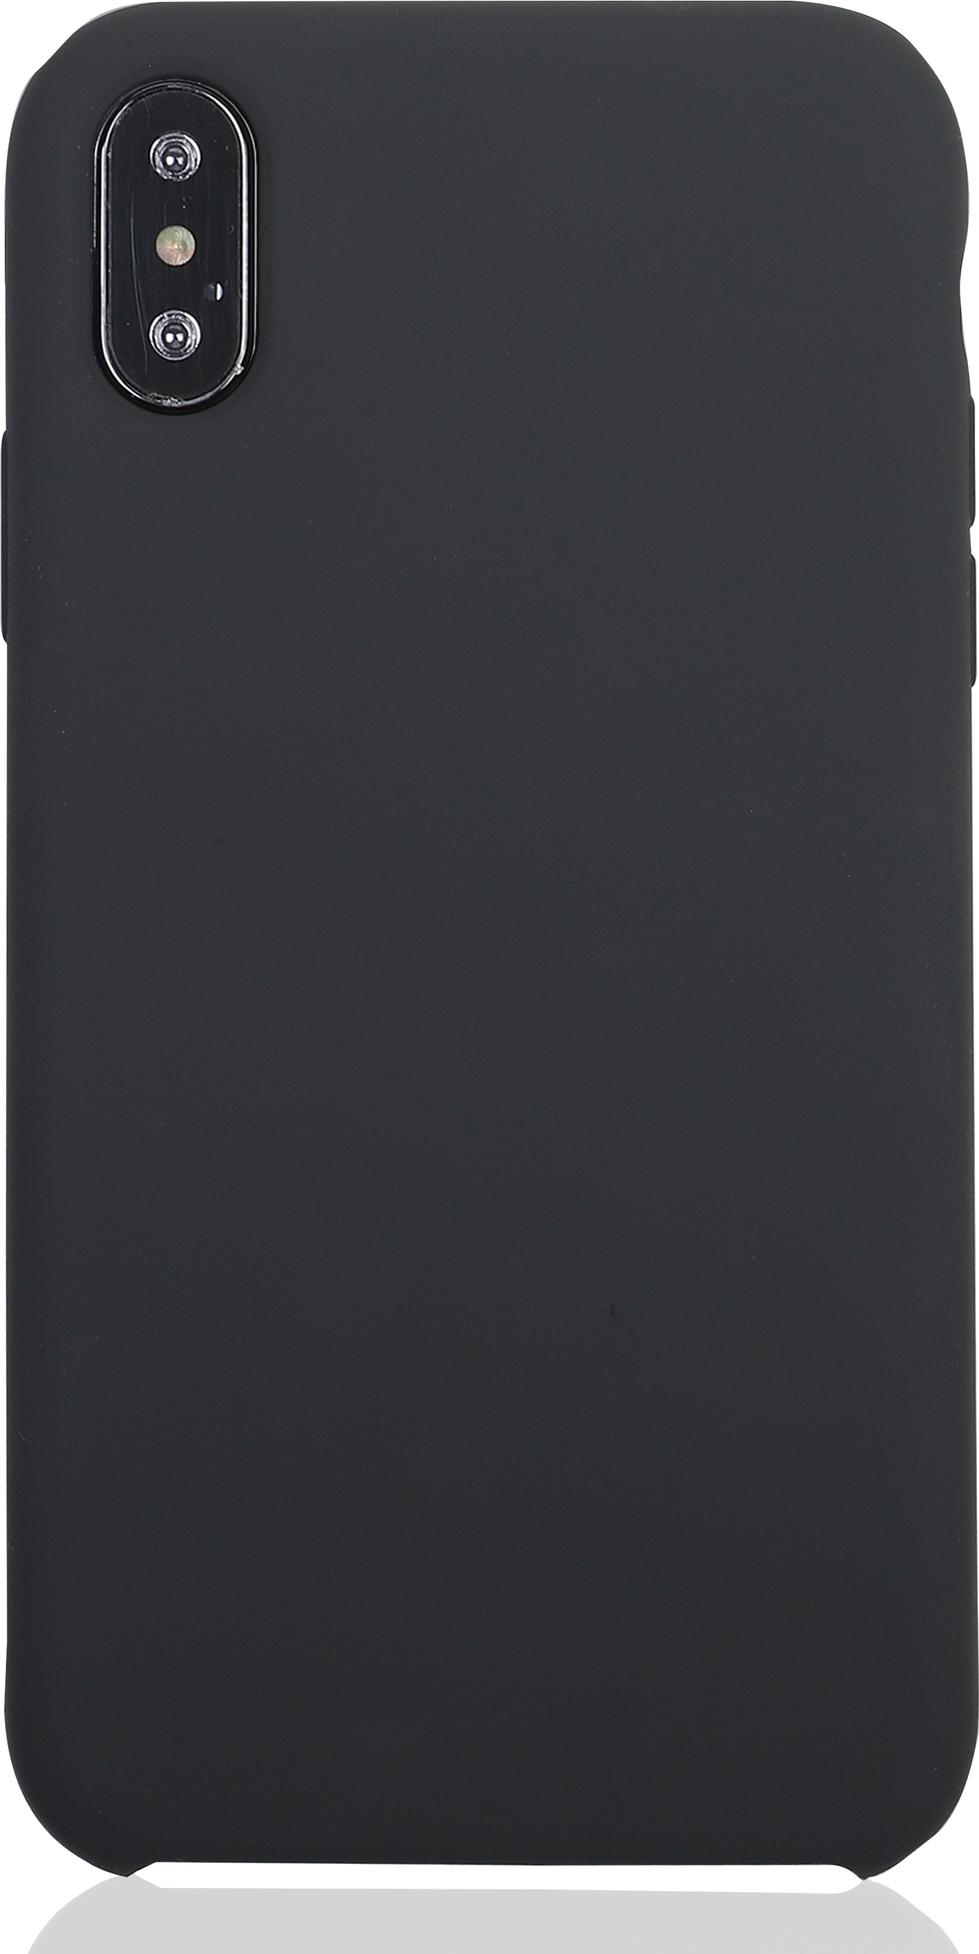 Чехол Brosco Softrubber для Apple iPhone XS Max, серый аксессуар чехол для apple iphone 6 brosco soft rubber black ip6 softrubber black